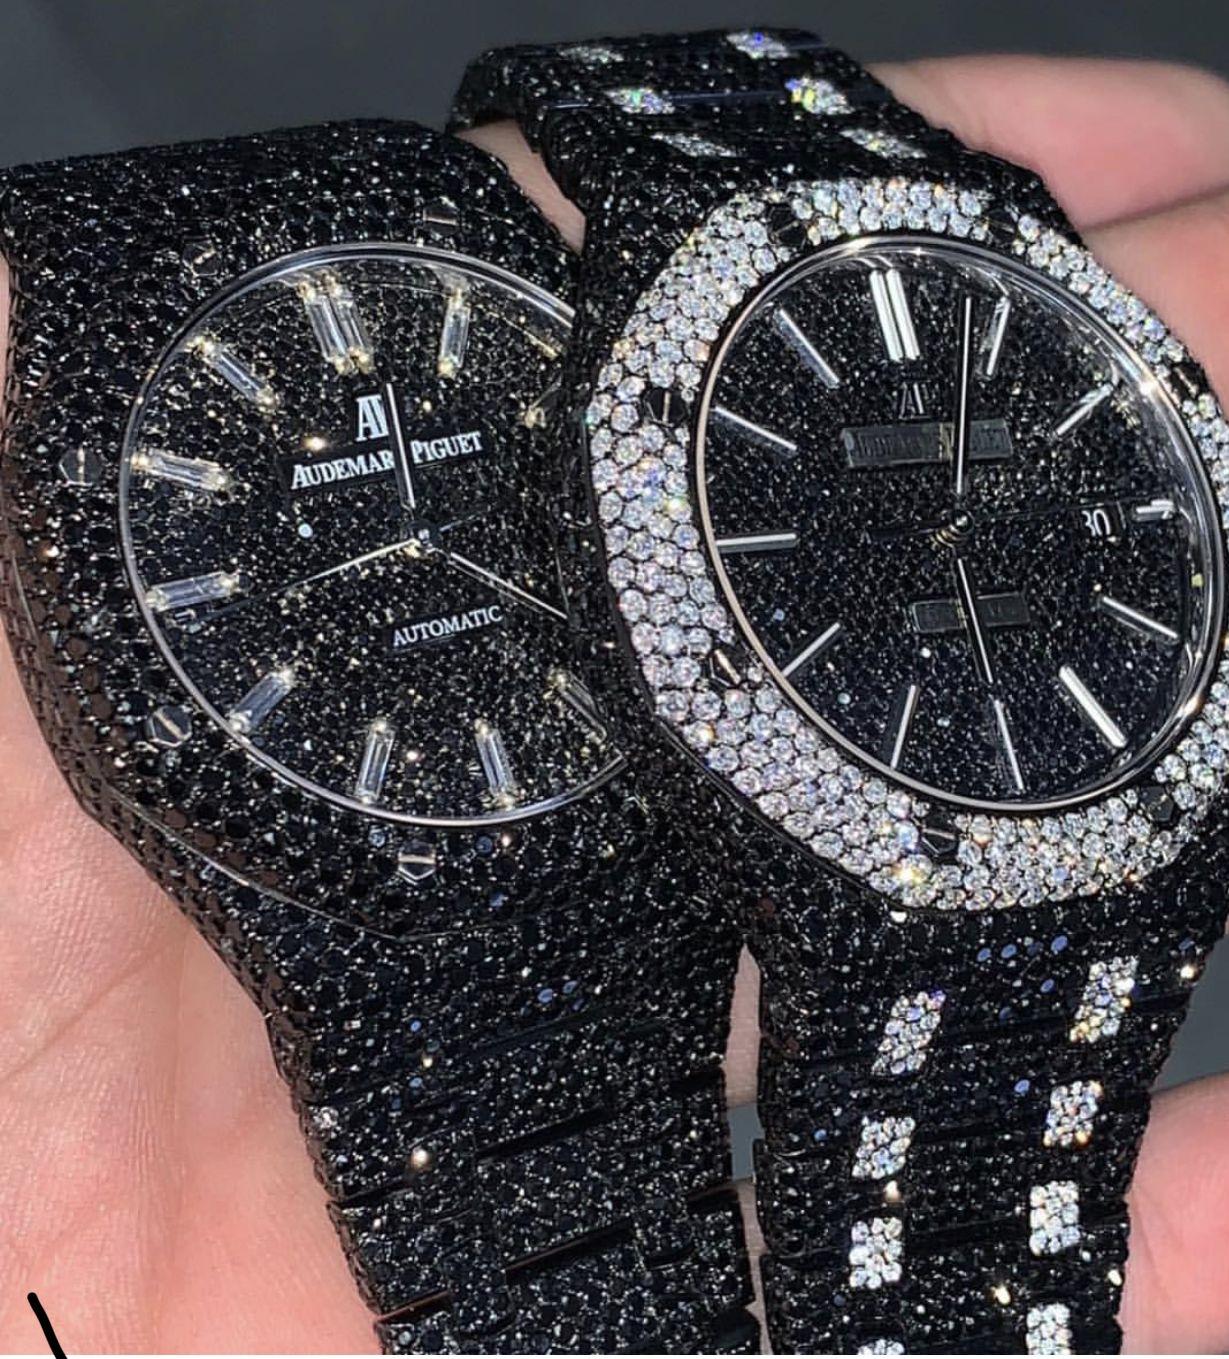 Pin By Isaiah Rubio On Jewllery Diamond Watches For Men Black Diamond Watch Fashion Watches